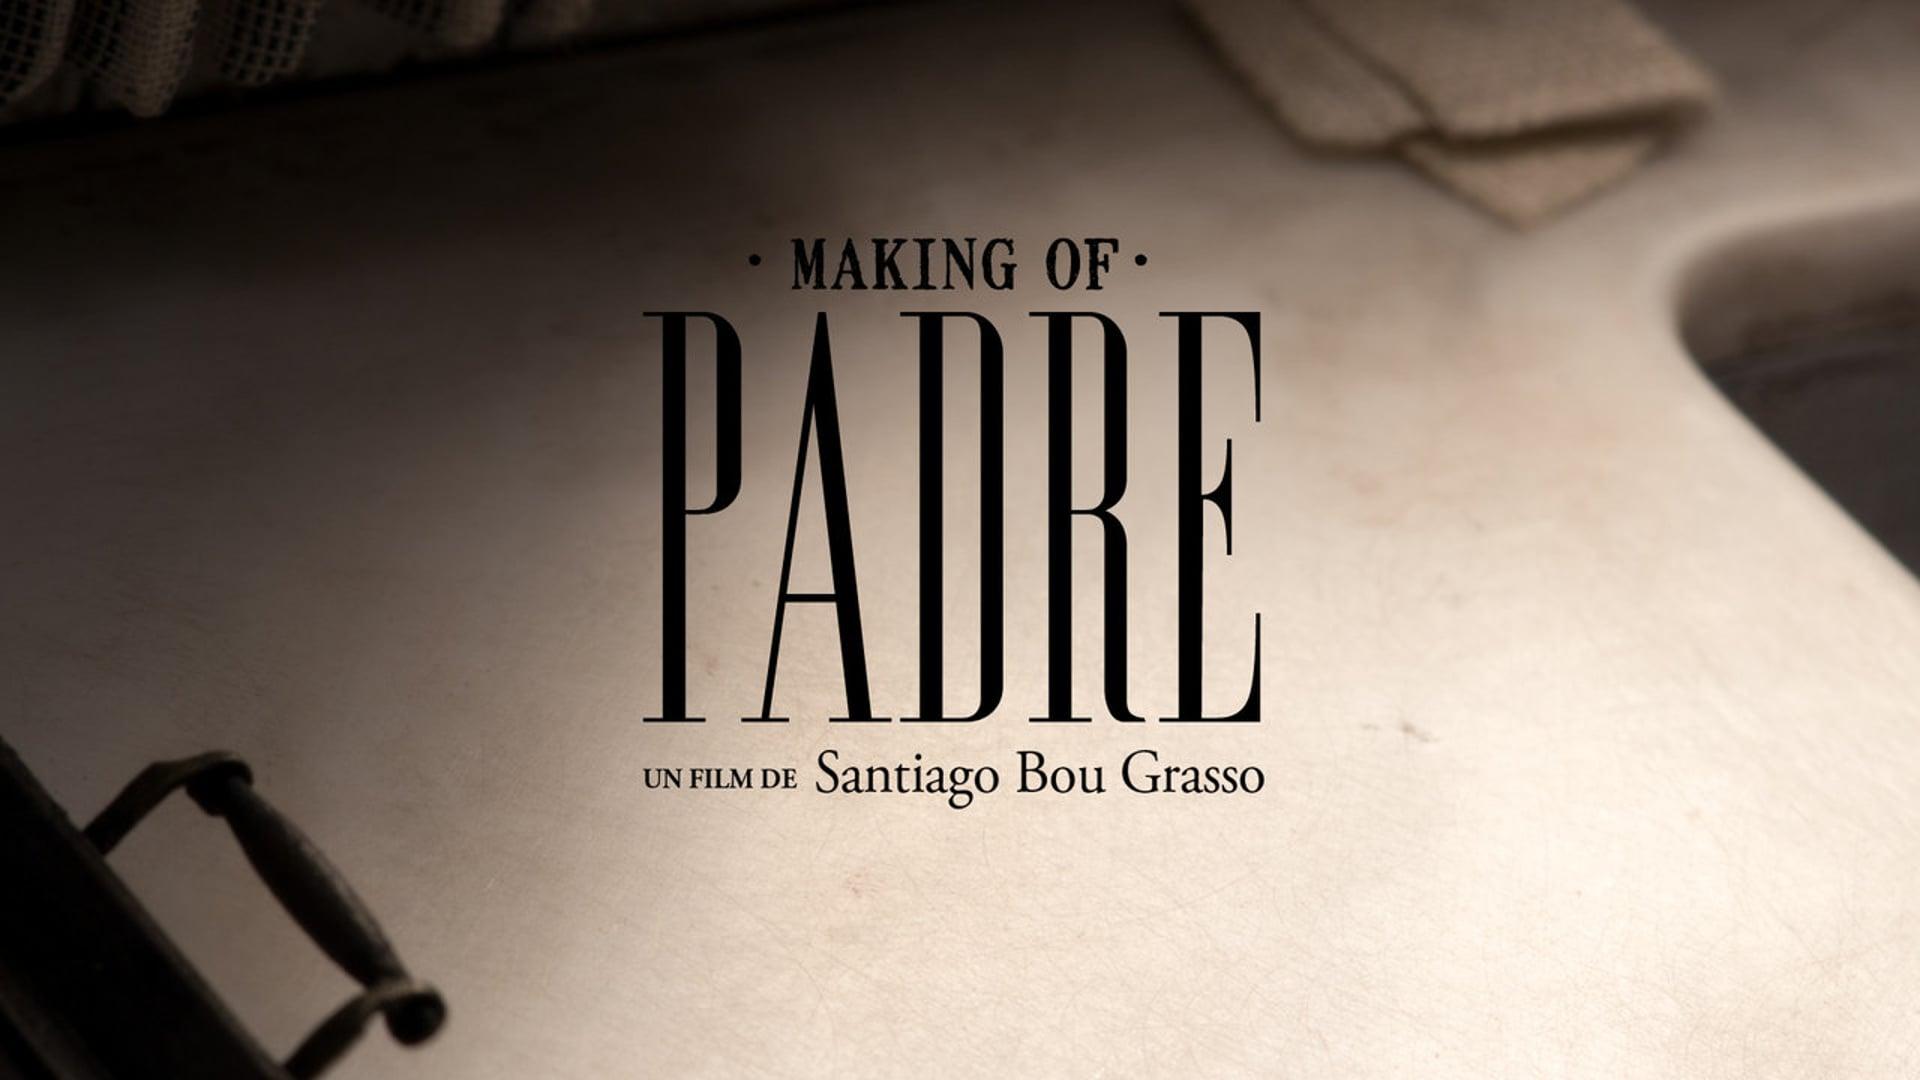 PADRE - short film making of